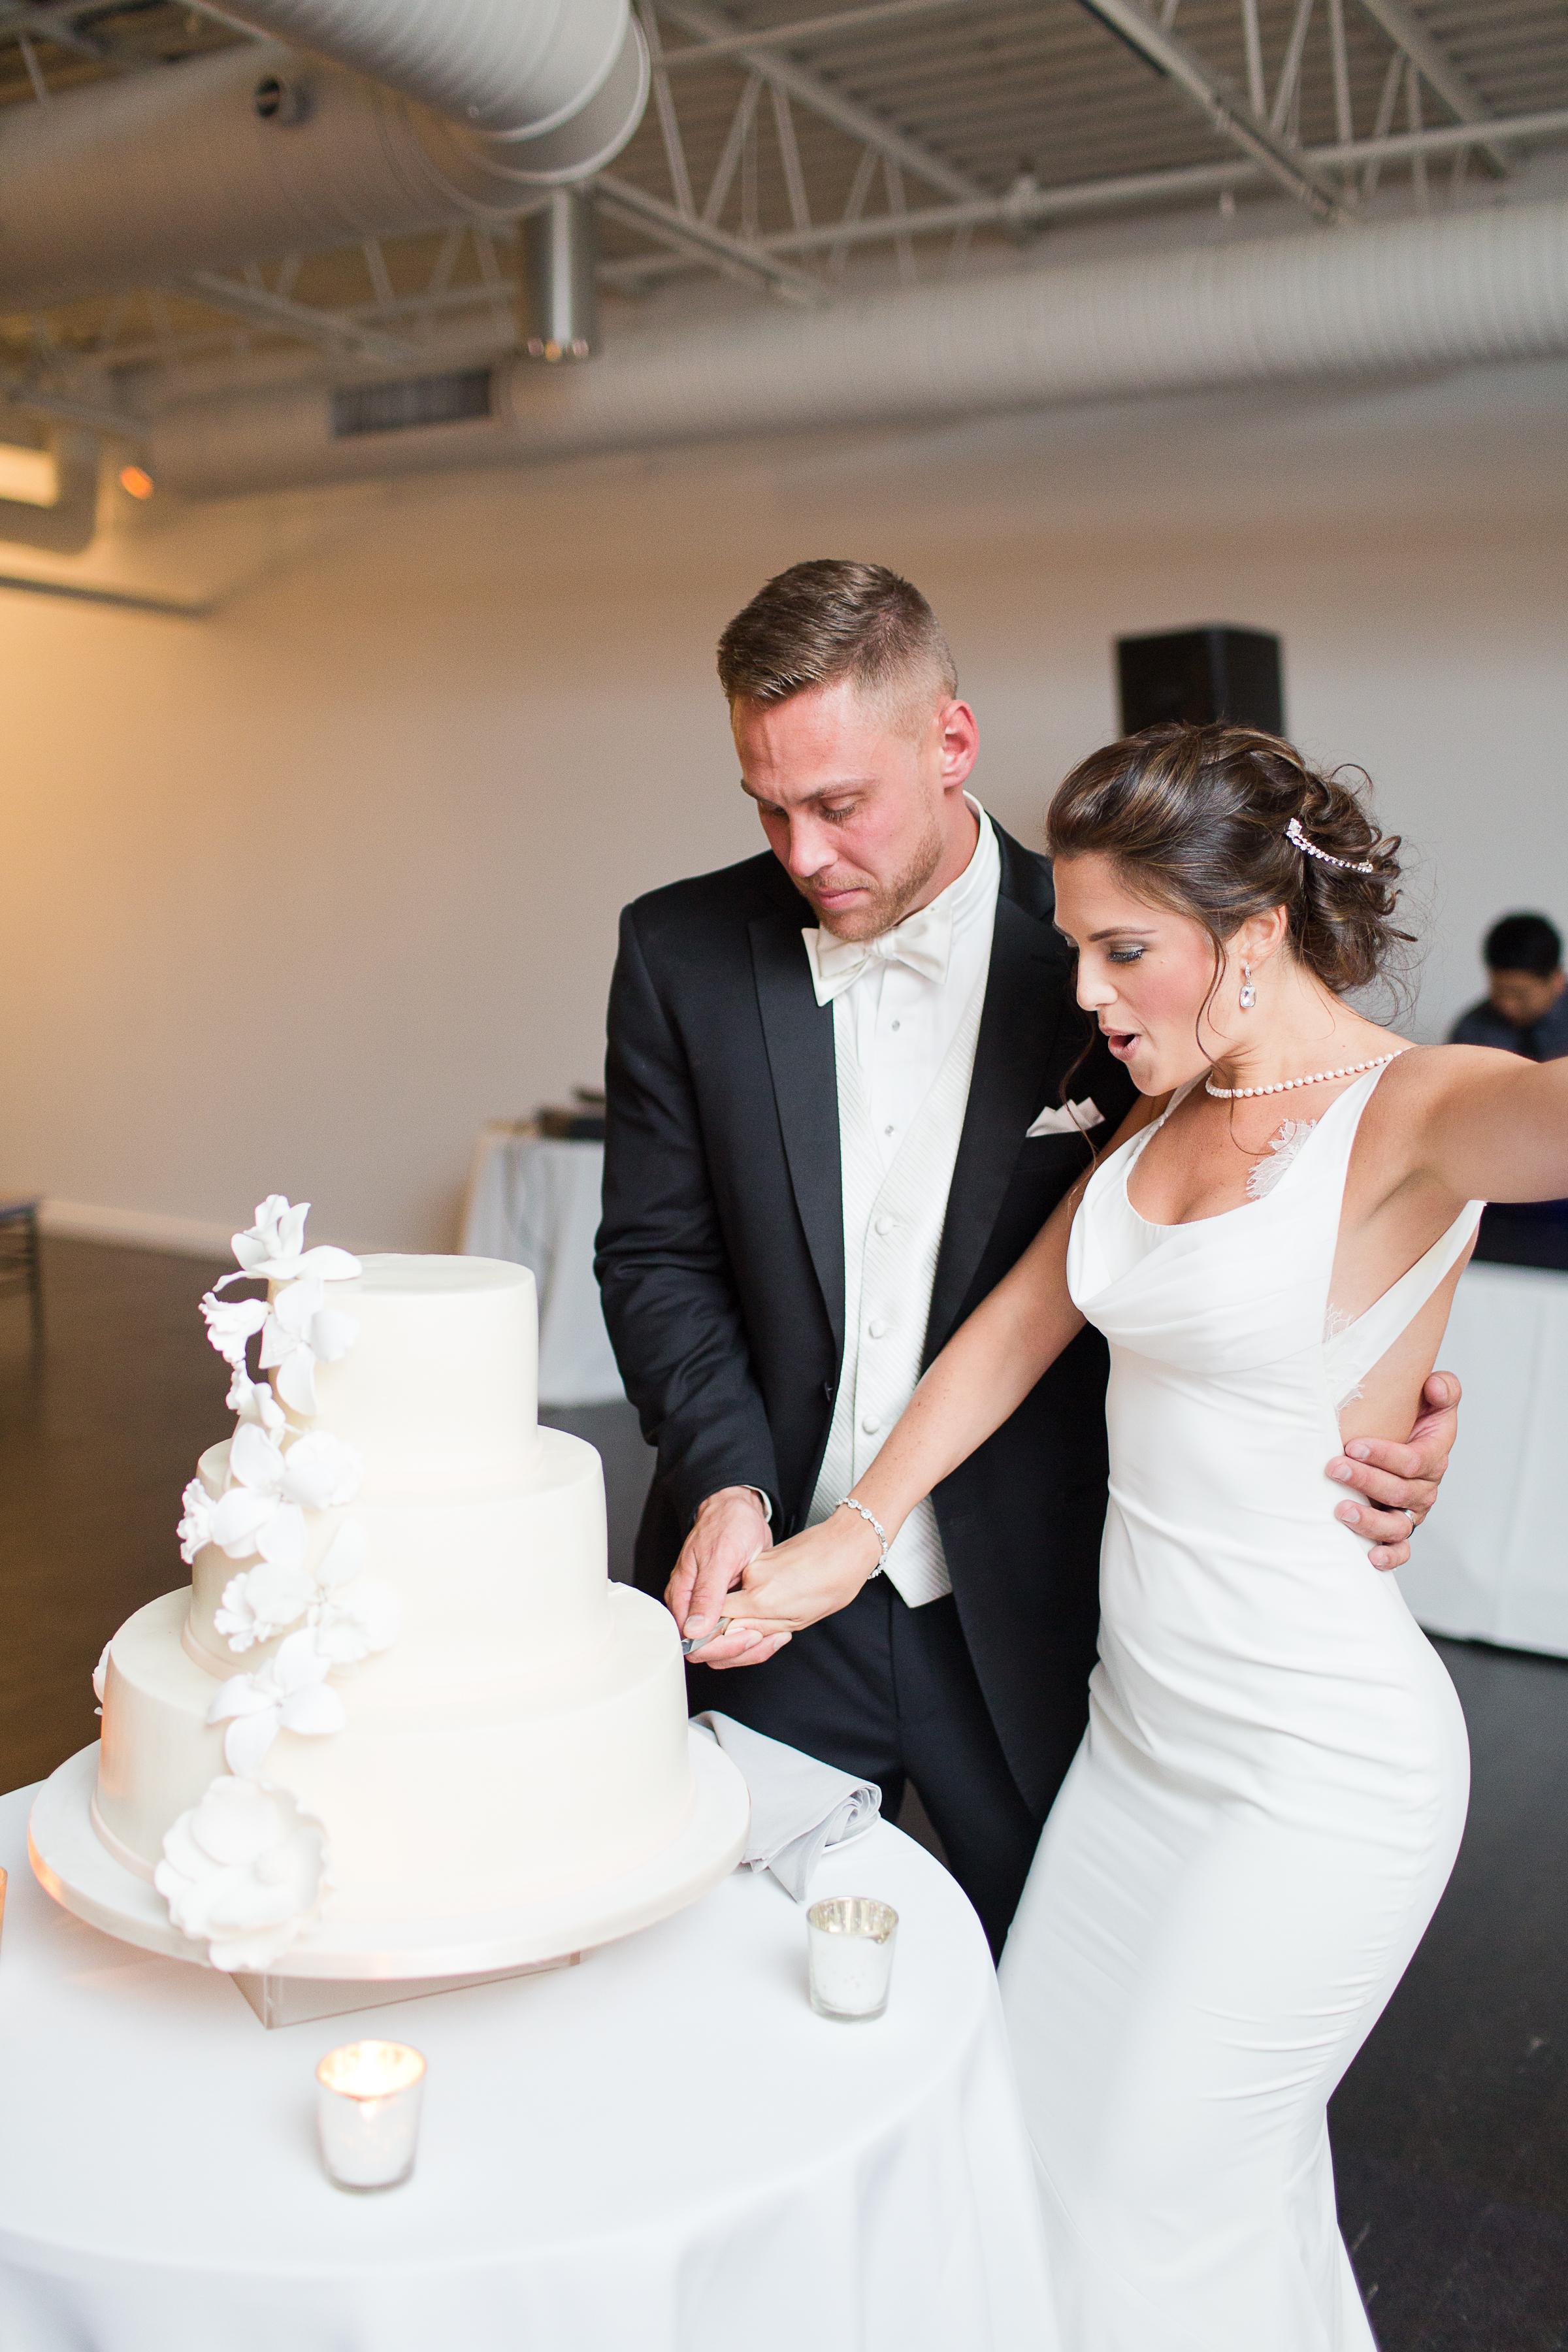 Melissa Kruse Photography - Genna + Anthony The Loading Dock Stamford CT Wedding-1088.jpg